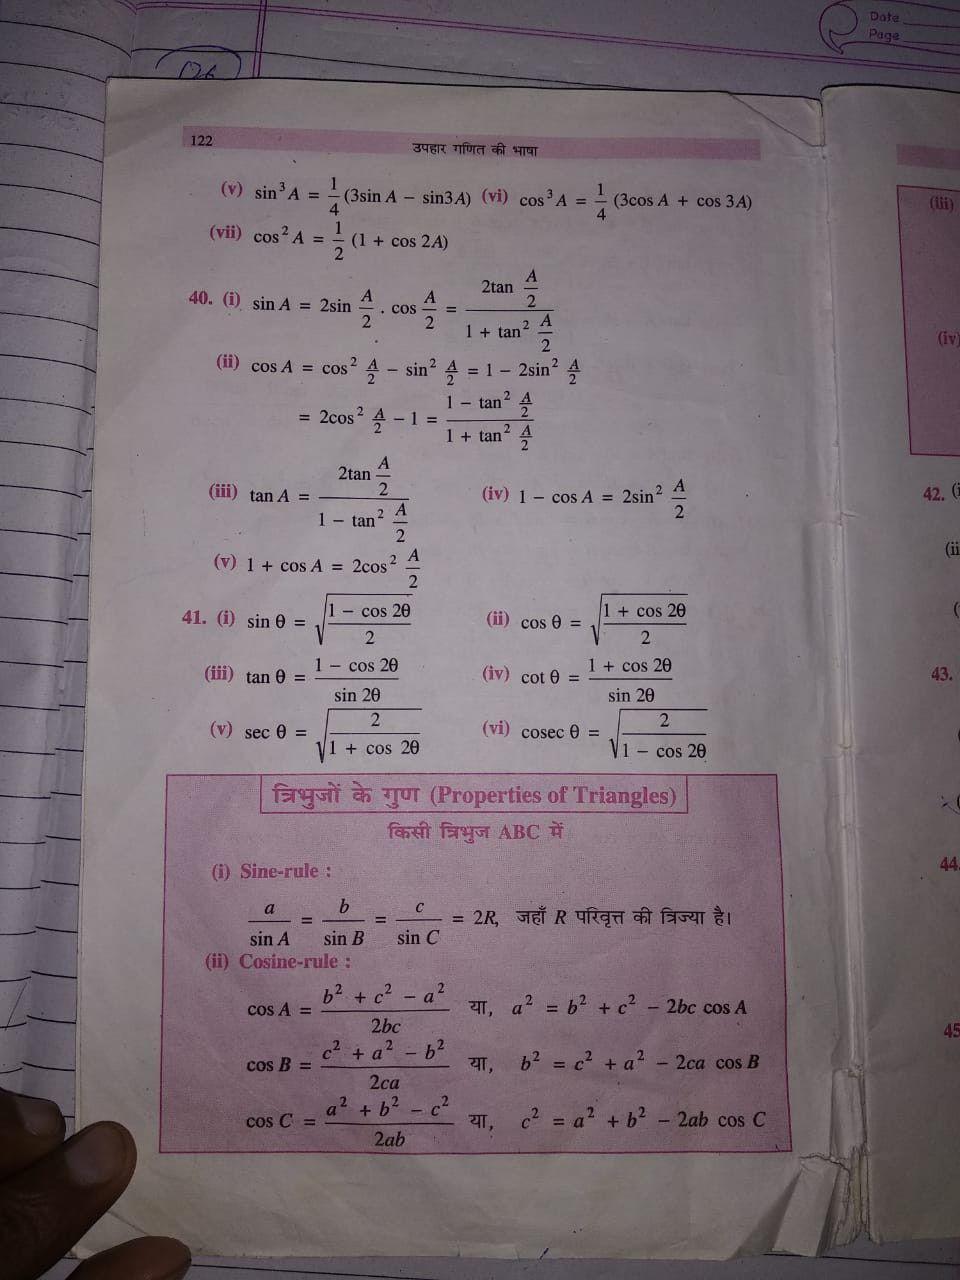 Pin By Ameer Afzaly On Math Formulas Math Notes Math Formulas Math [ 1280 x 960 Pixel ]